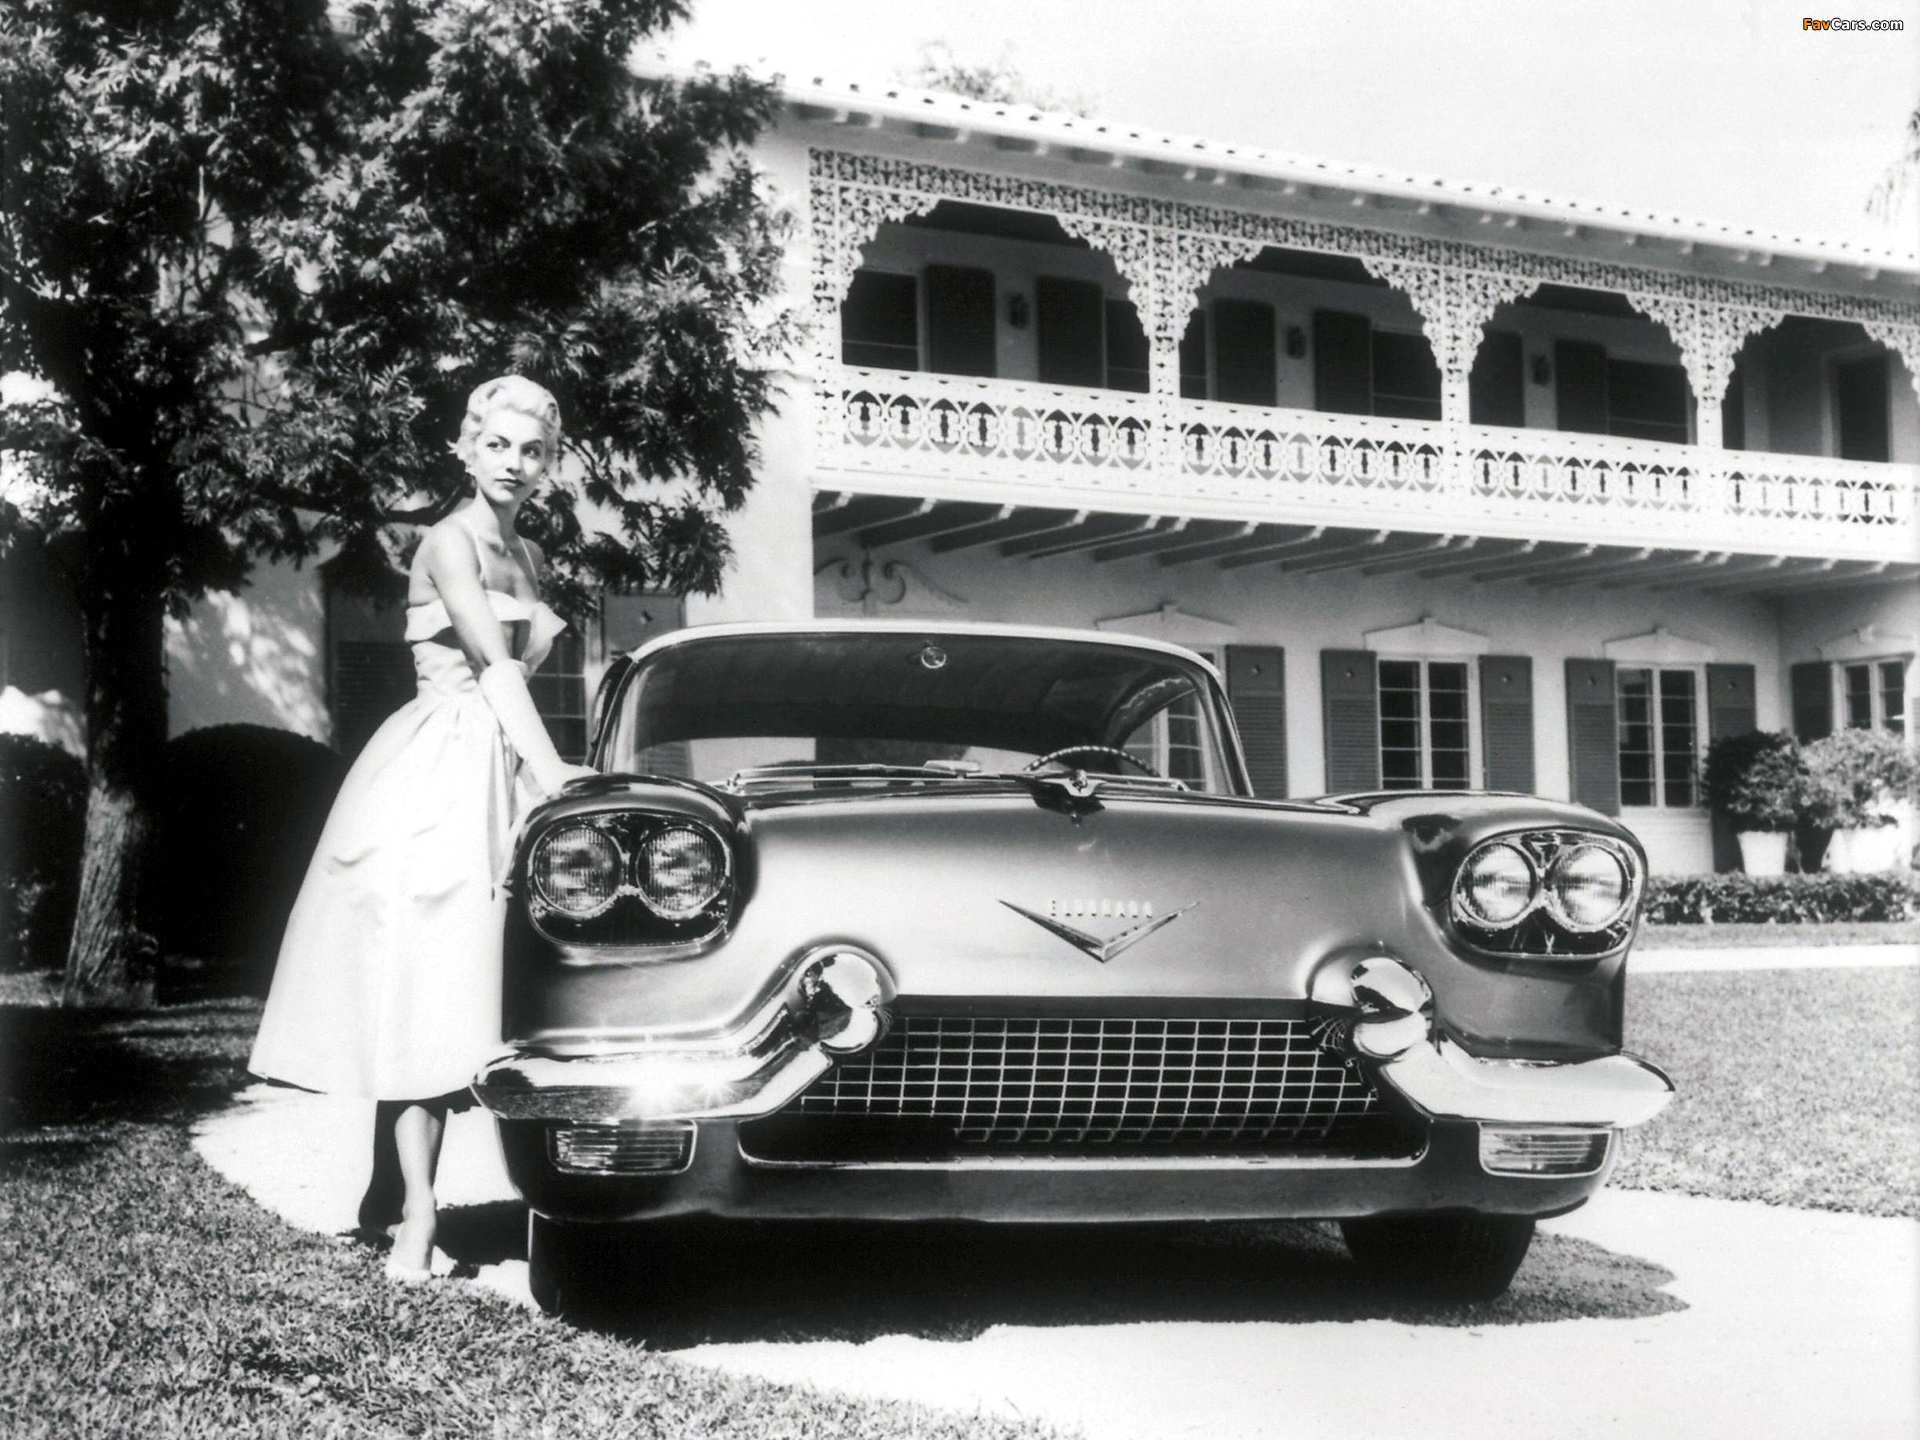 Cadillac Eldorado Brougham Dream Car 1955 wallpapers (1920 x 1440)